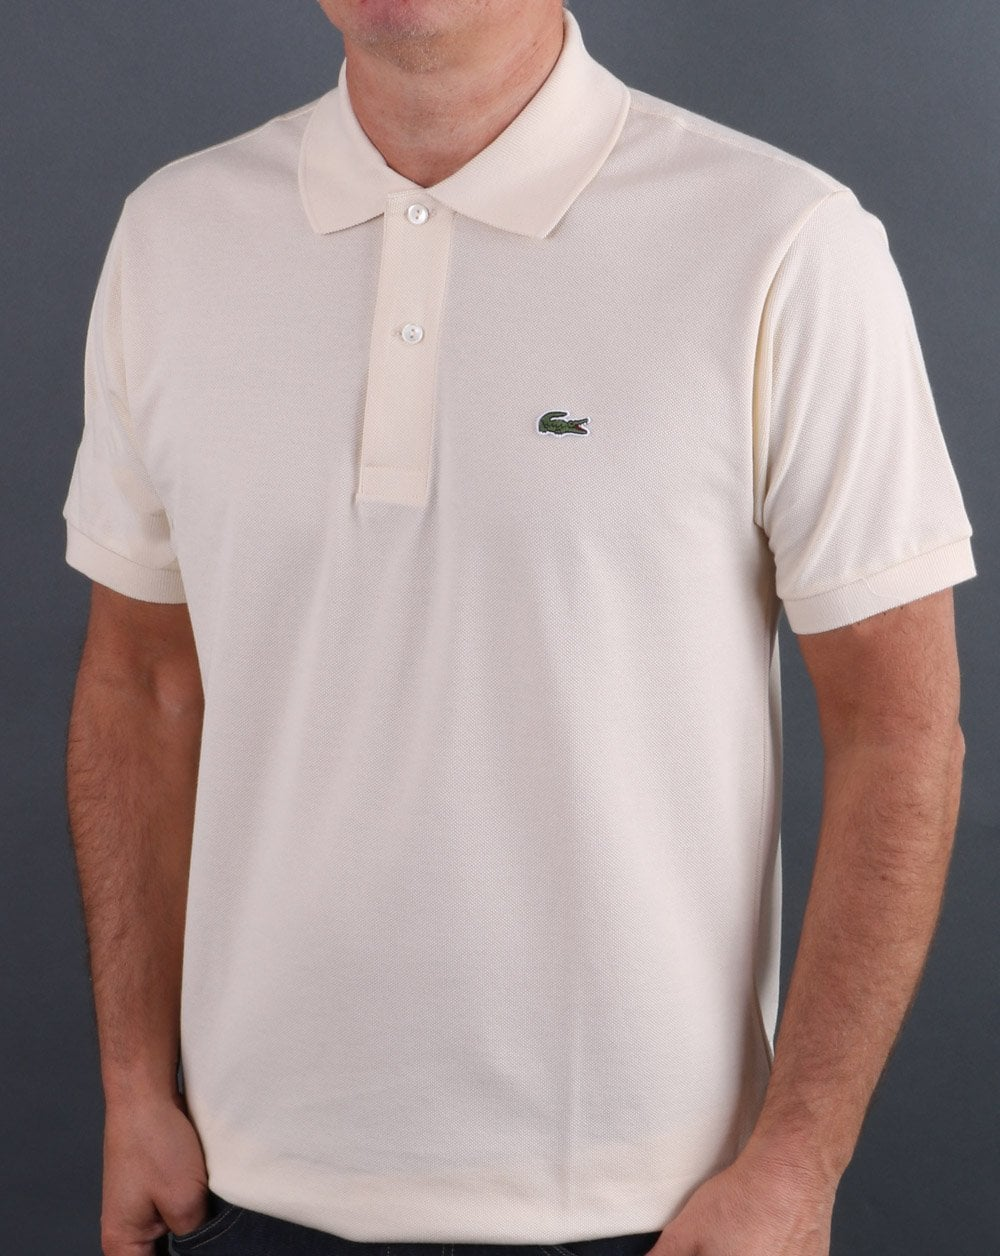 Lacoste Polo Shirt Vanilla Cream